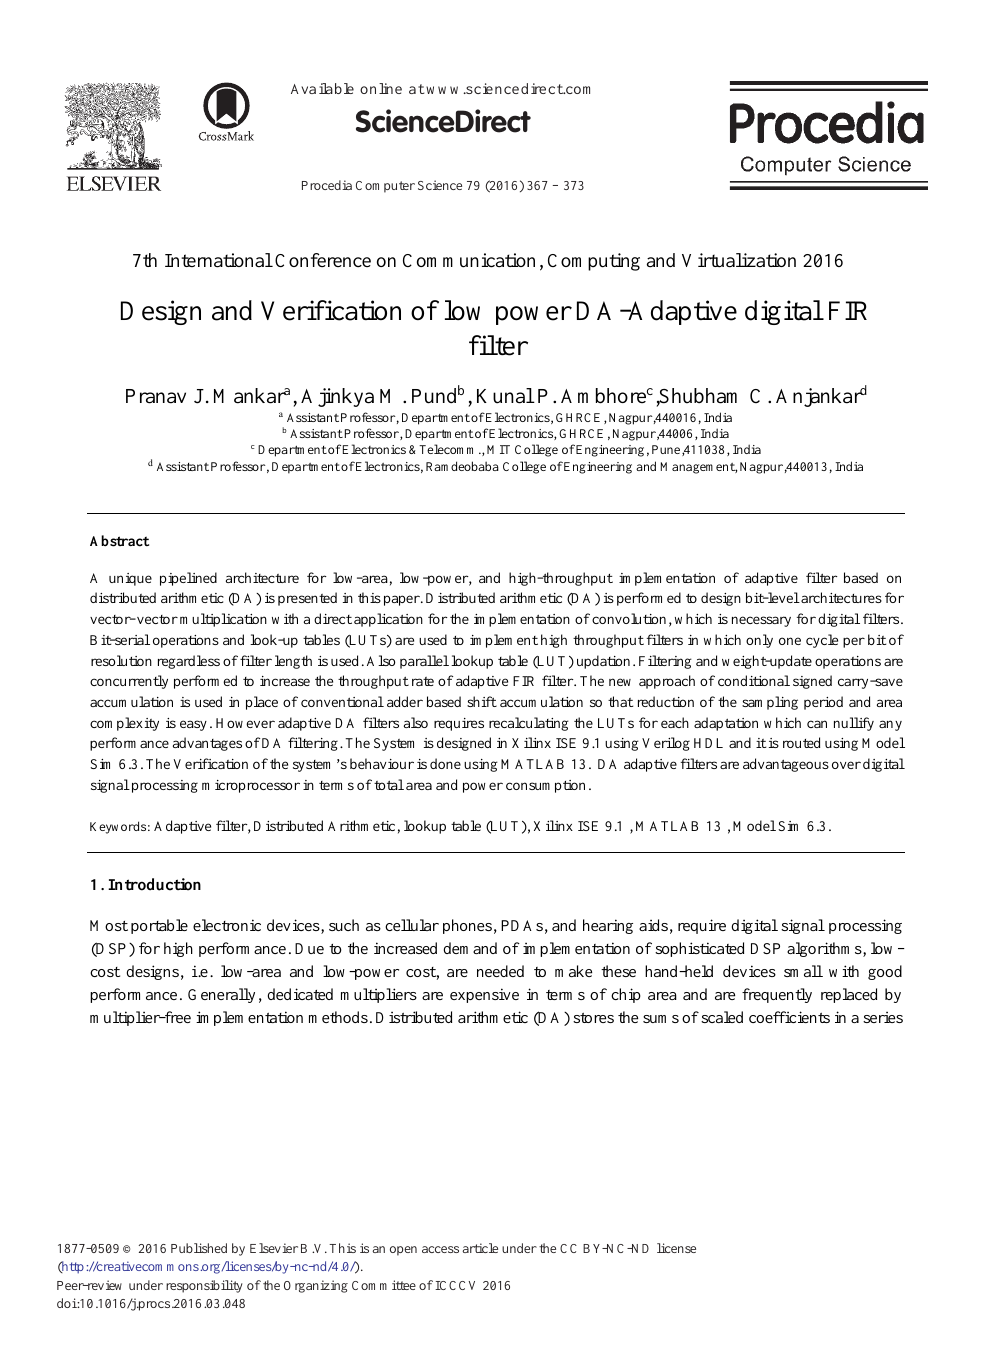 Design and Verification of Low Power DA-Adaptive Digital FIR